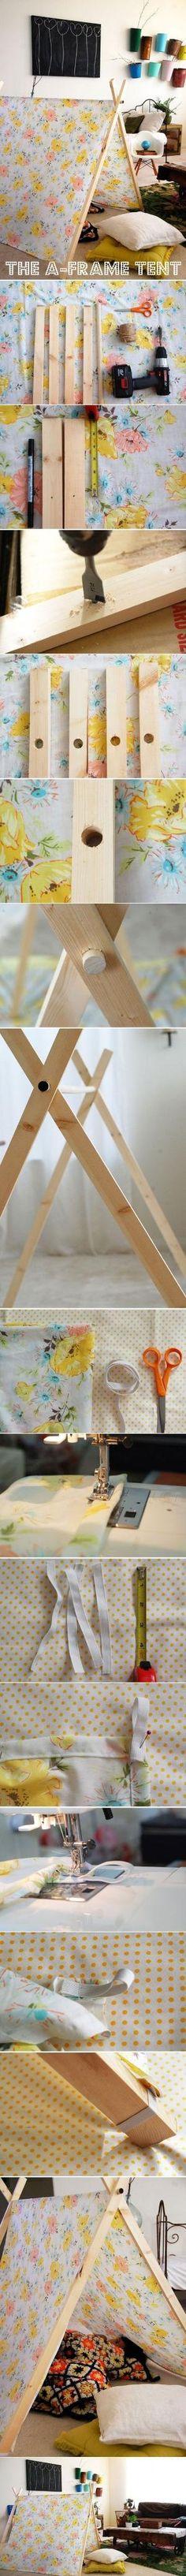 DIY tent! by alhely